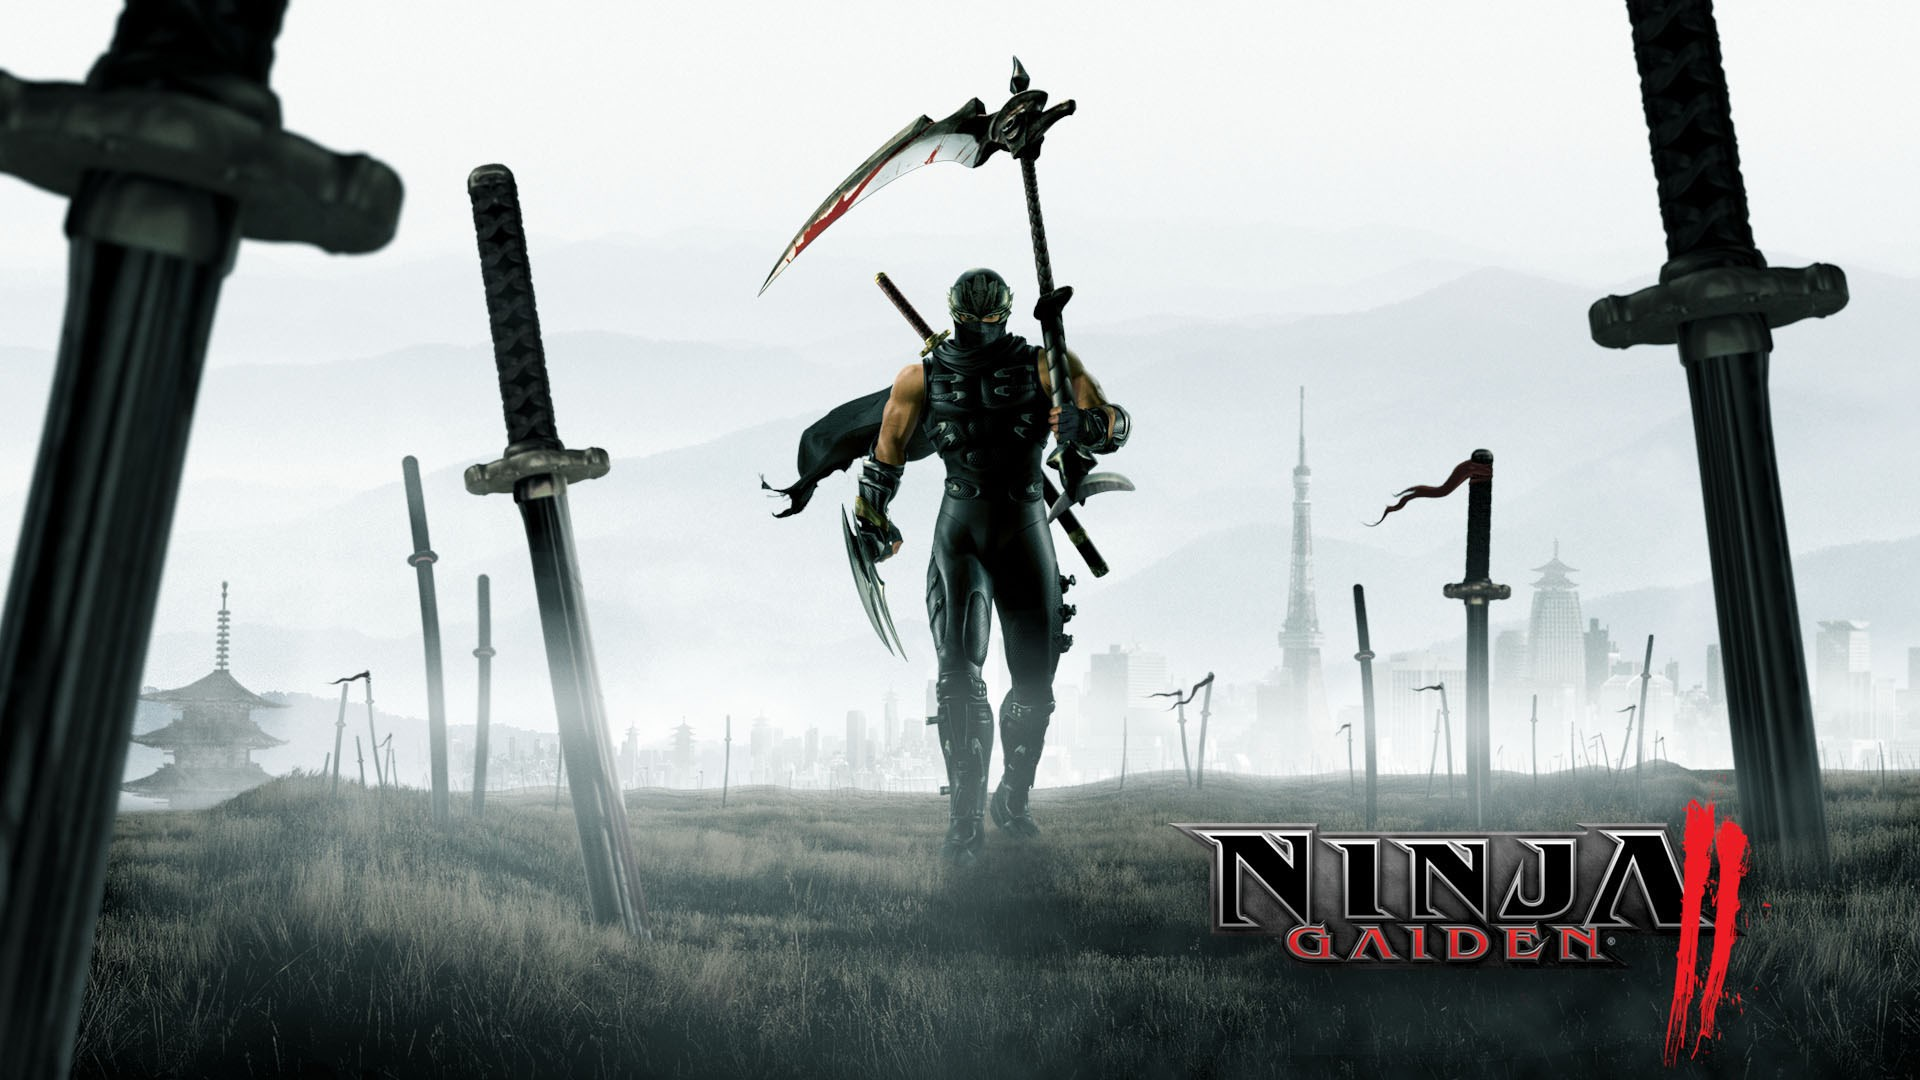 ninja gaiden xbox series x